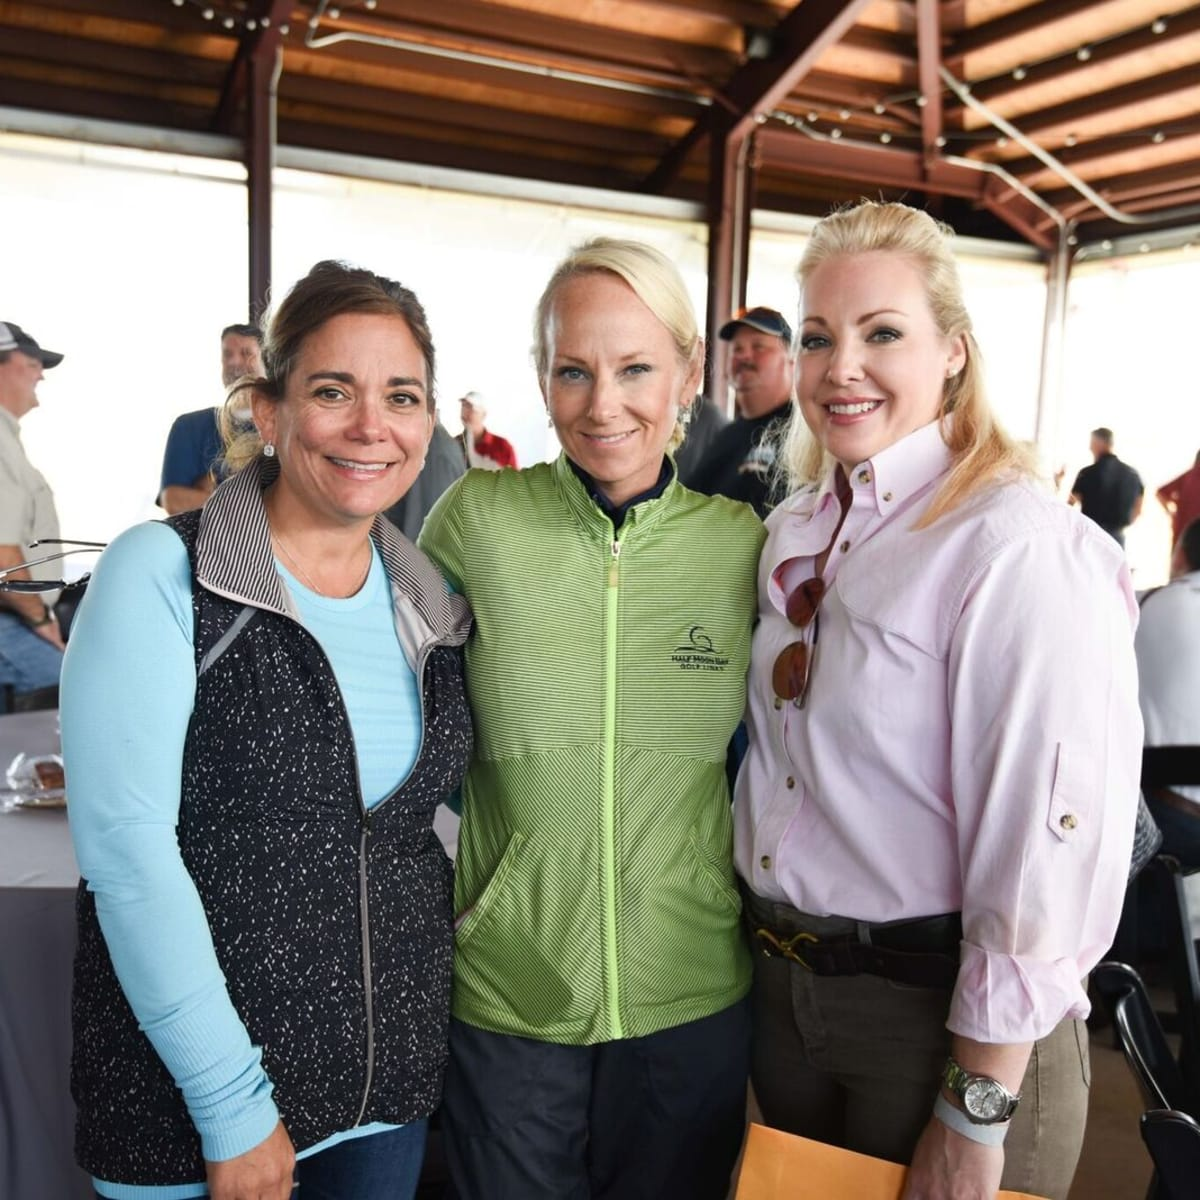 Carmen Mach, Melanie Rothwell, Katherine Stacy at Memorial Hermann Clay Shoot